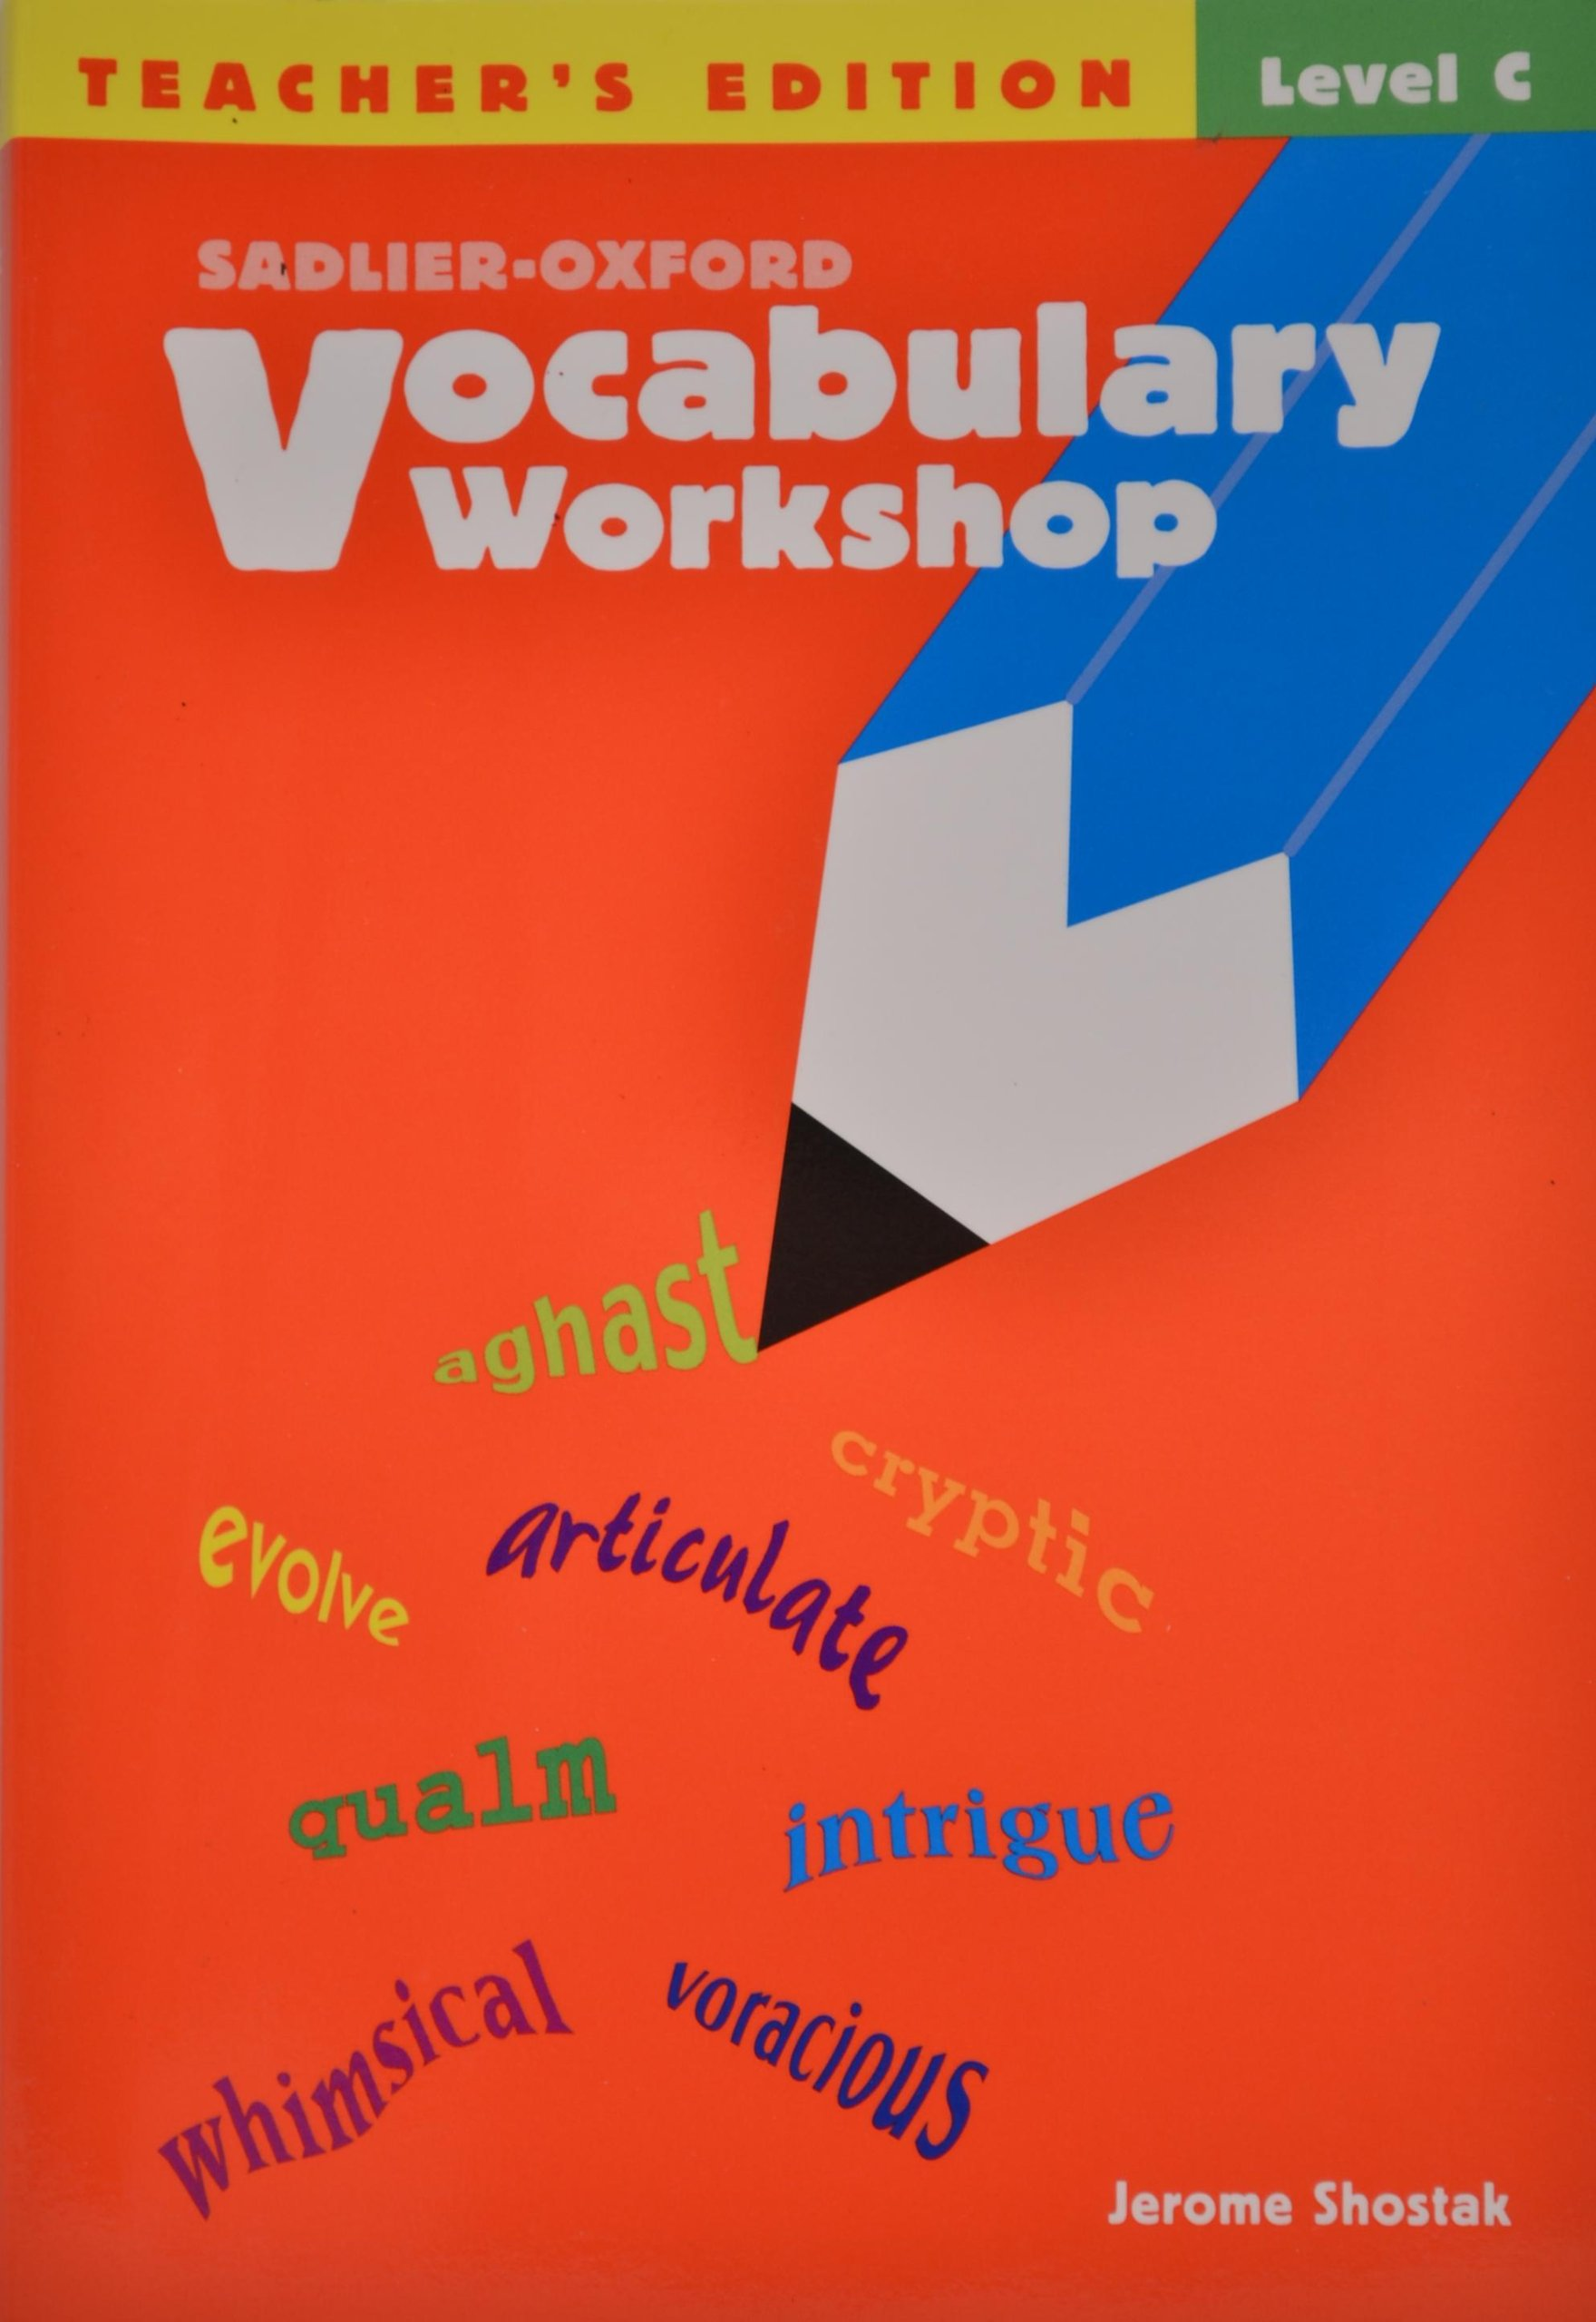 Amazon.com: Vocabulary Workshop, Level C, Teacher's Edition  (9780821576182): Jerome Shostak: Books